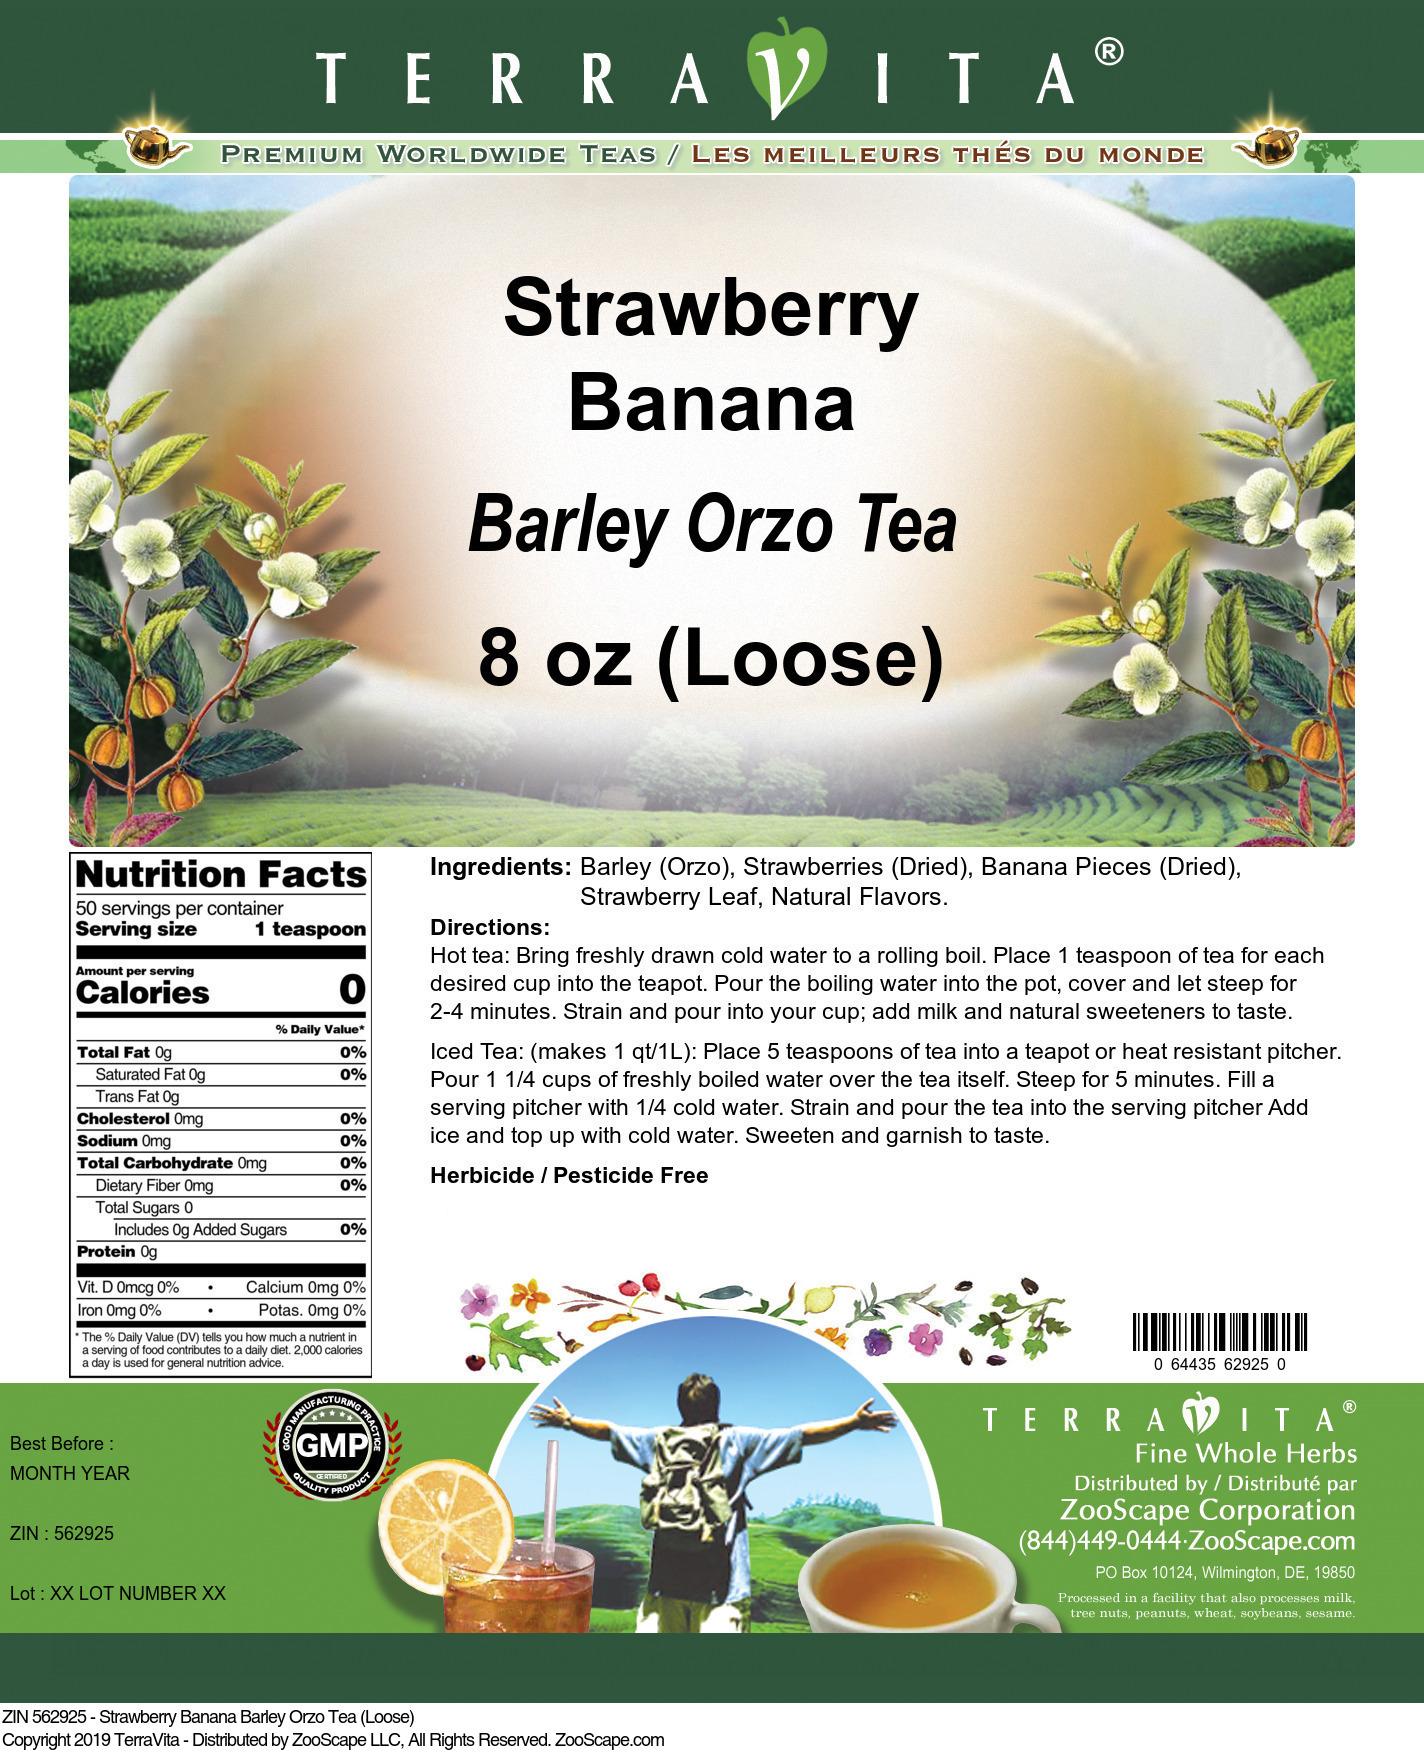 Strawberry Banana Barley Orzo Tea (Loose)